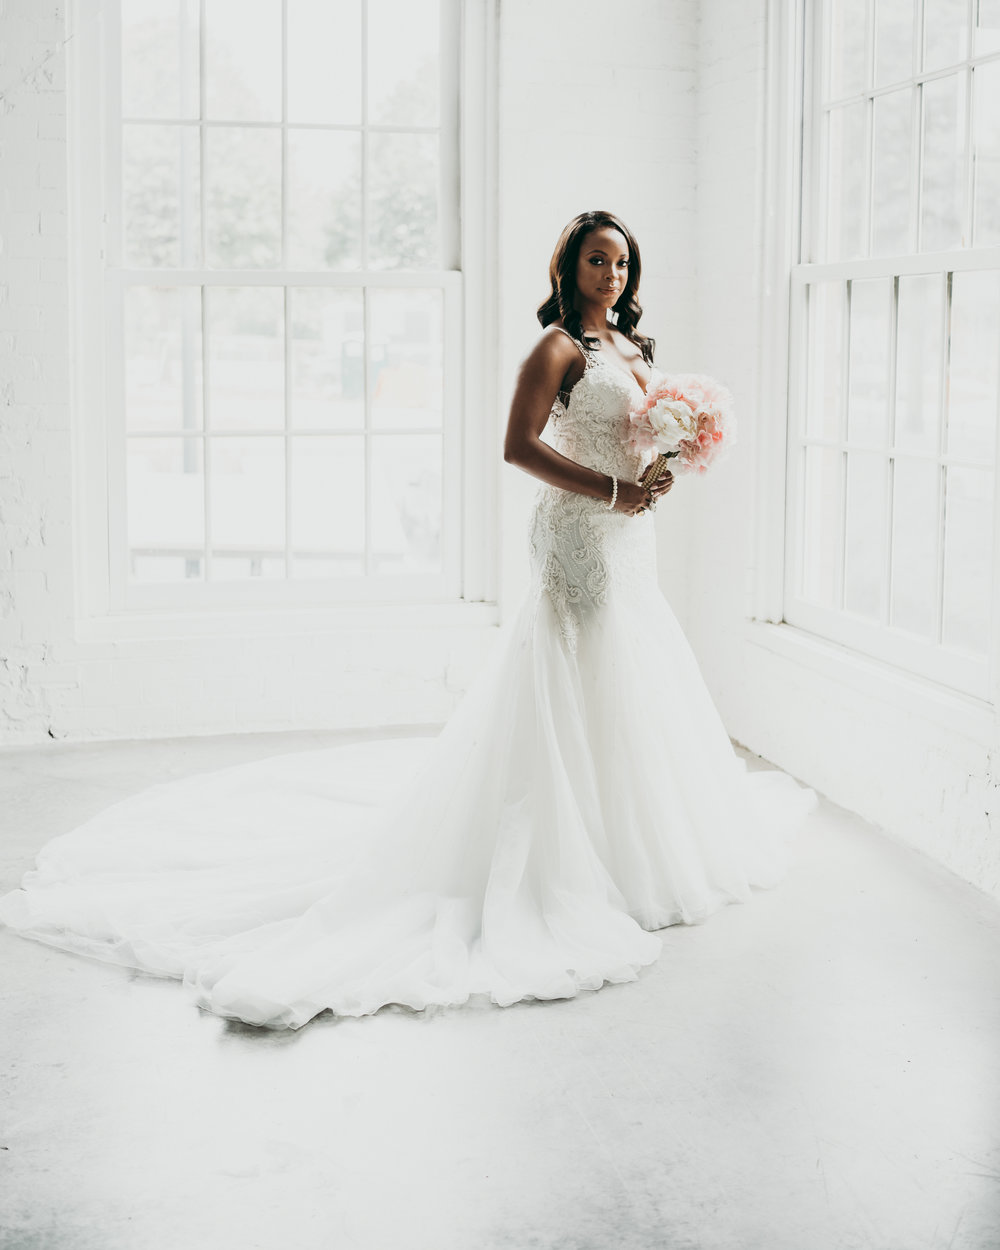 TheCoordinatedBride_Destinys-Bridal-Portraits_Ryan-Barnett_DSC04815.jpg